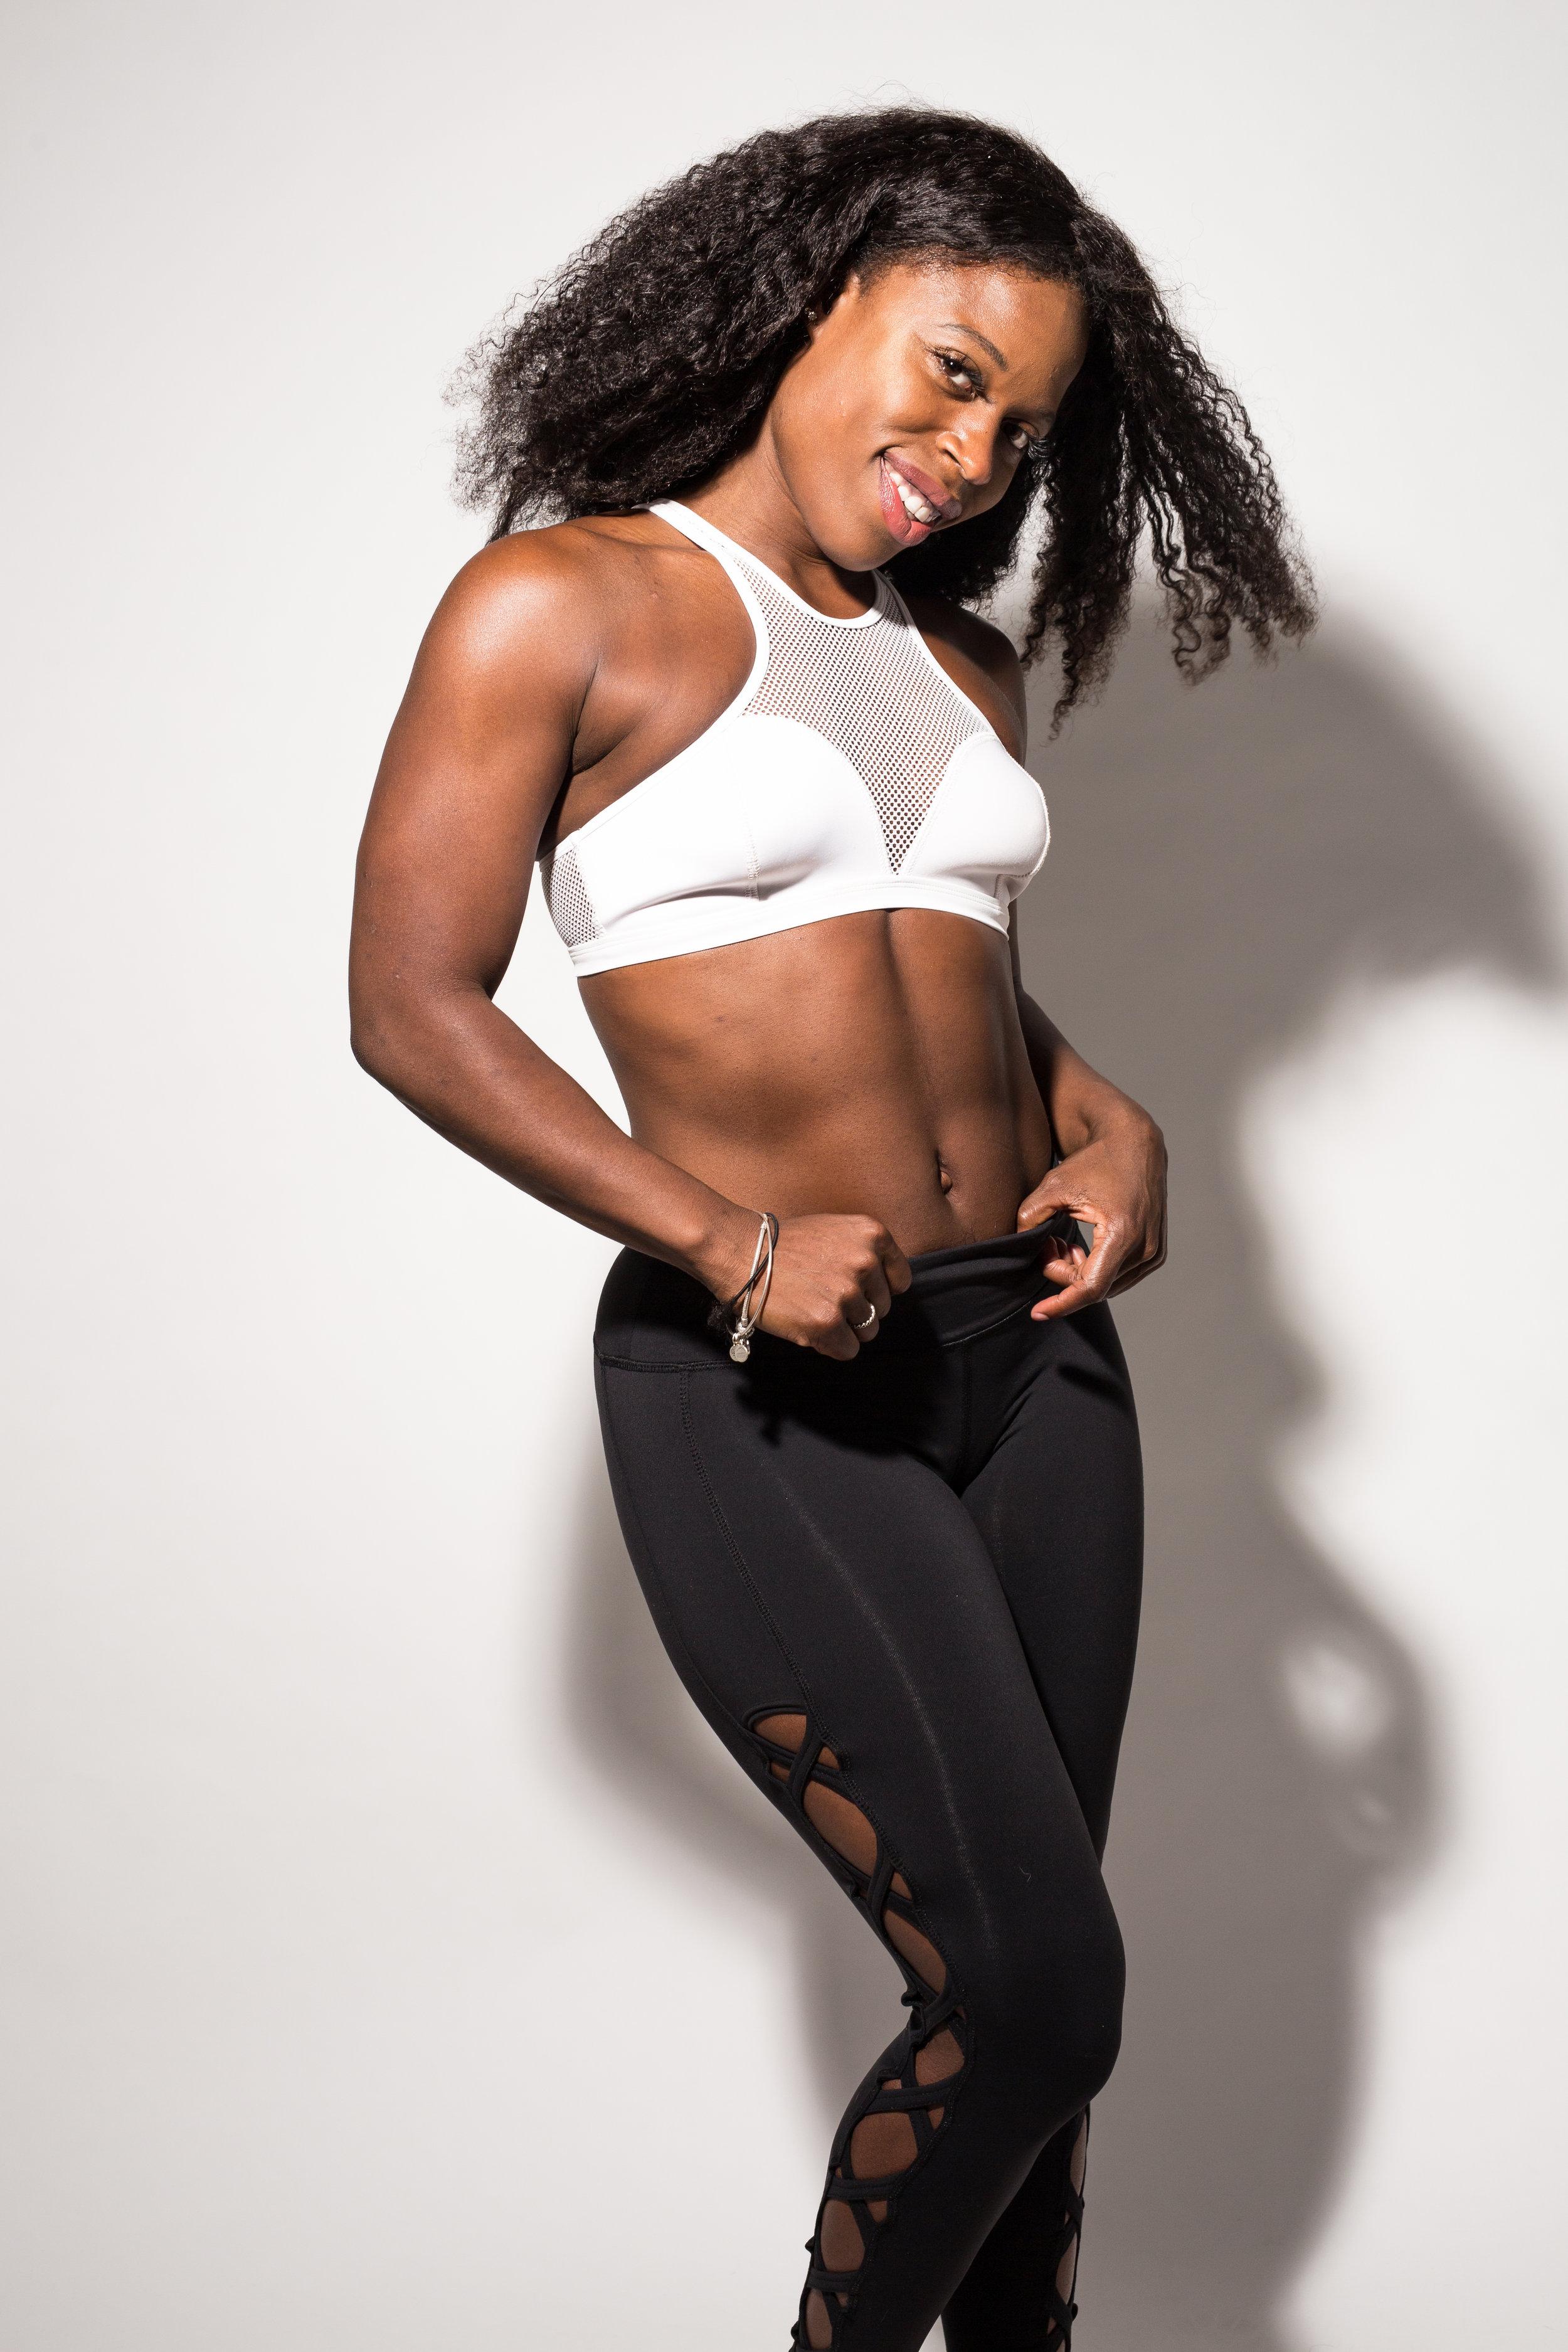 305 Fitness Dance Cardio Workout Layota